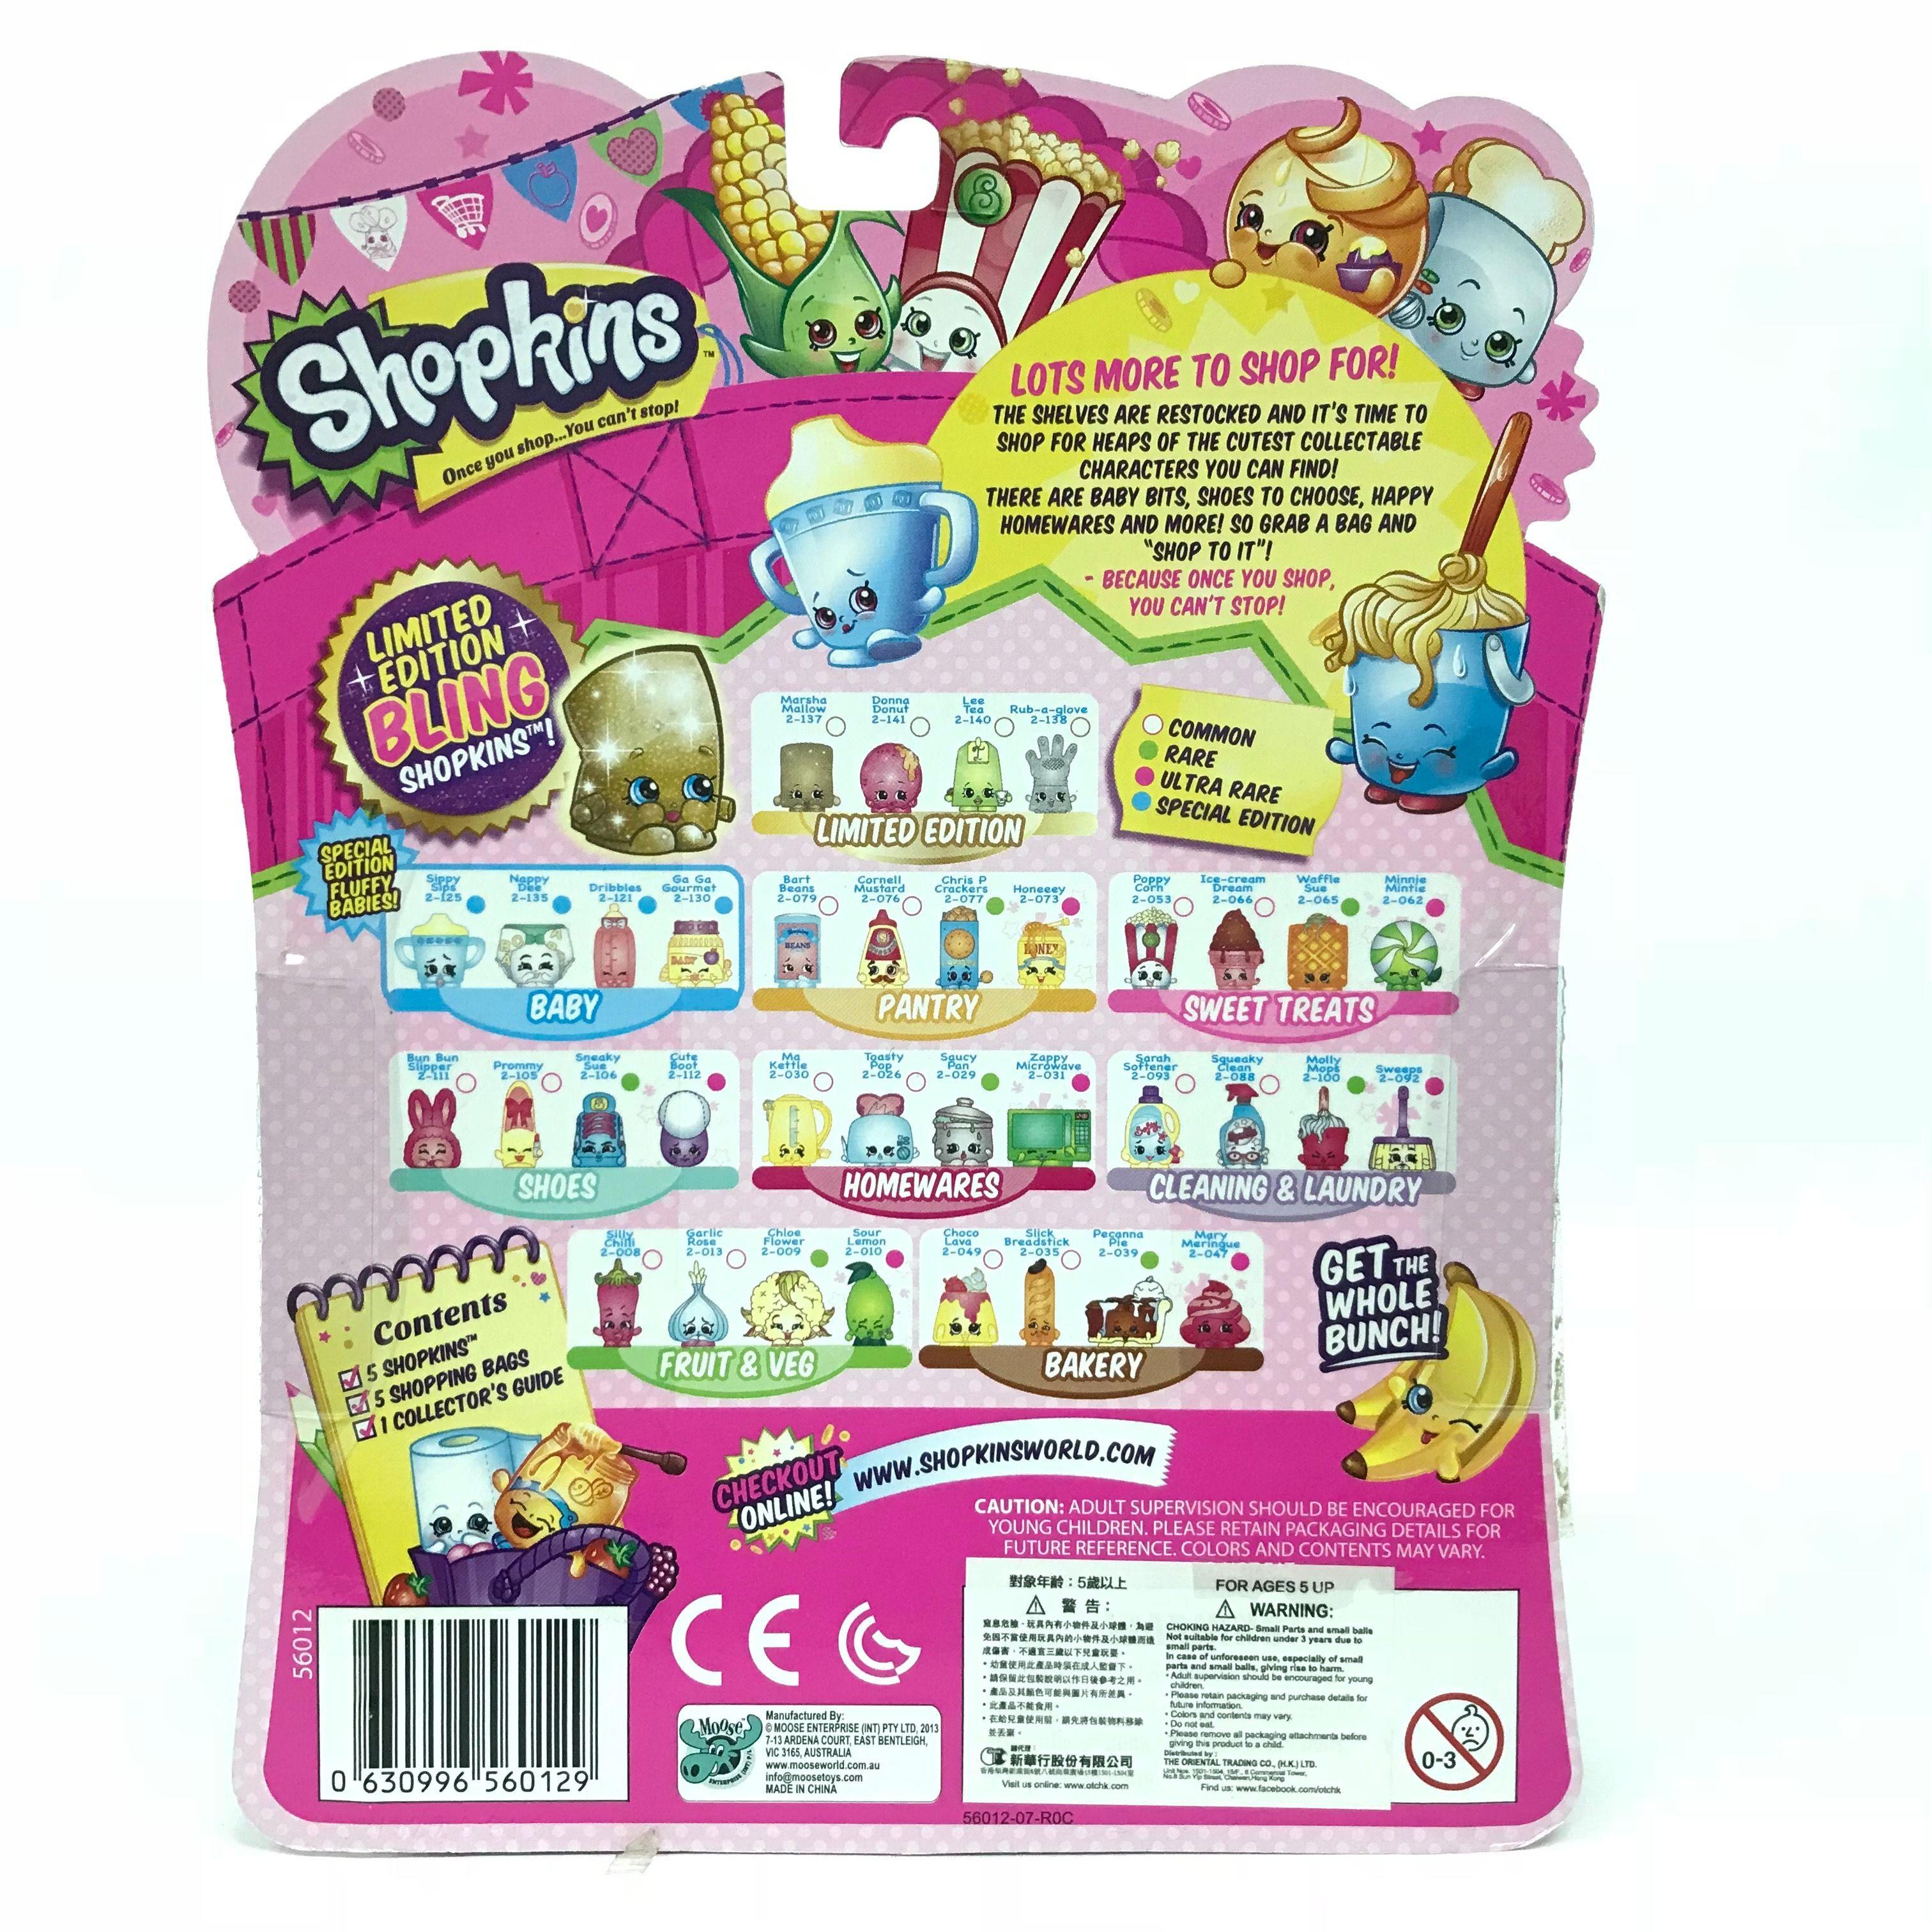 Shopkins-Season-2-Collectibles-Pack-of-5-Bags-Characters-Set thumbnail 4